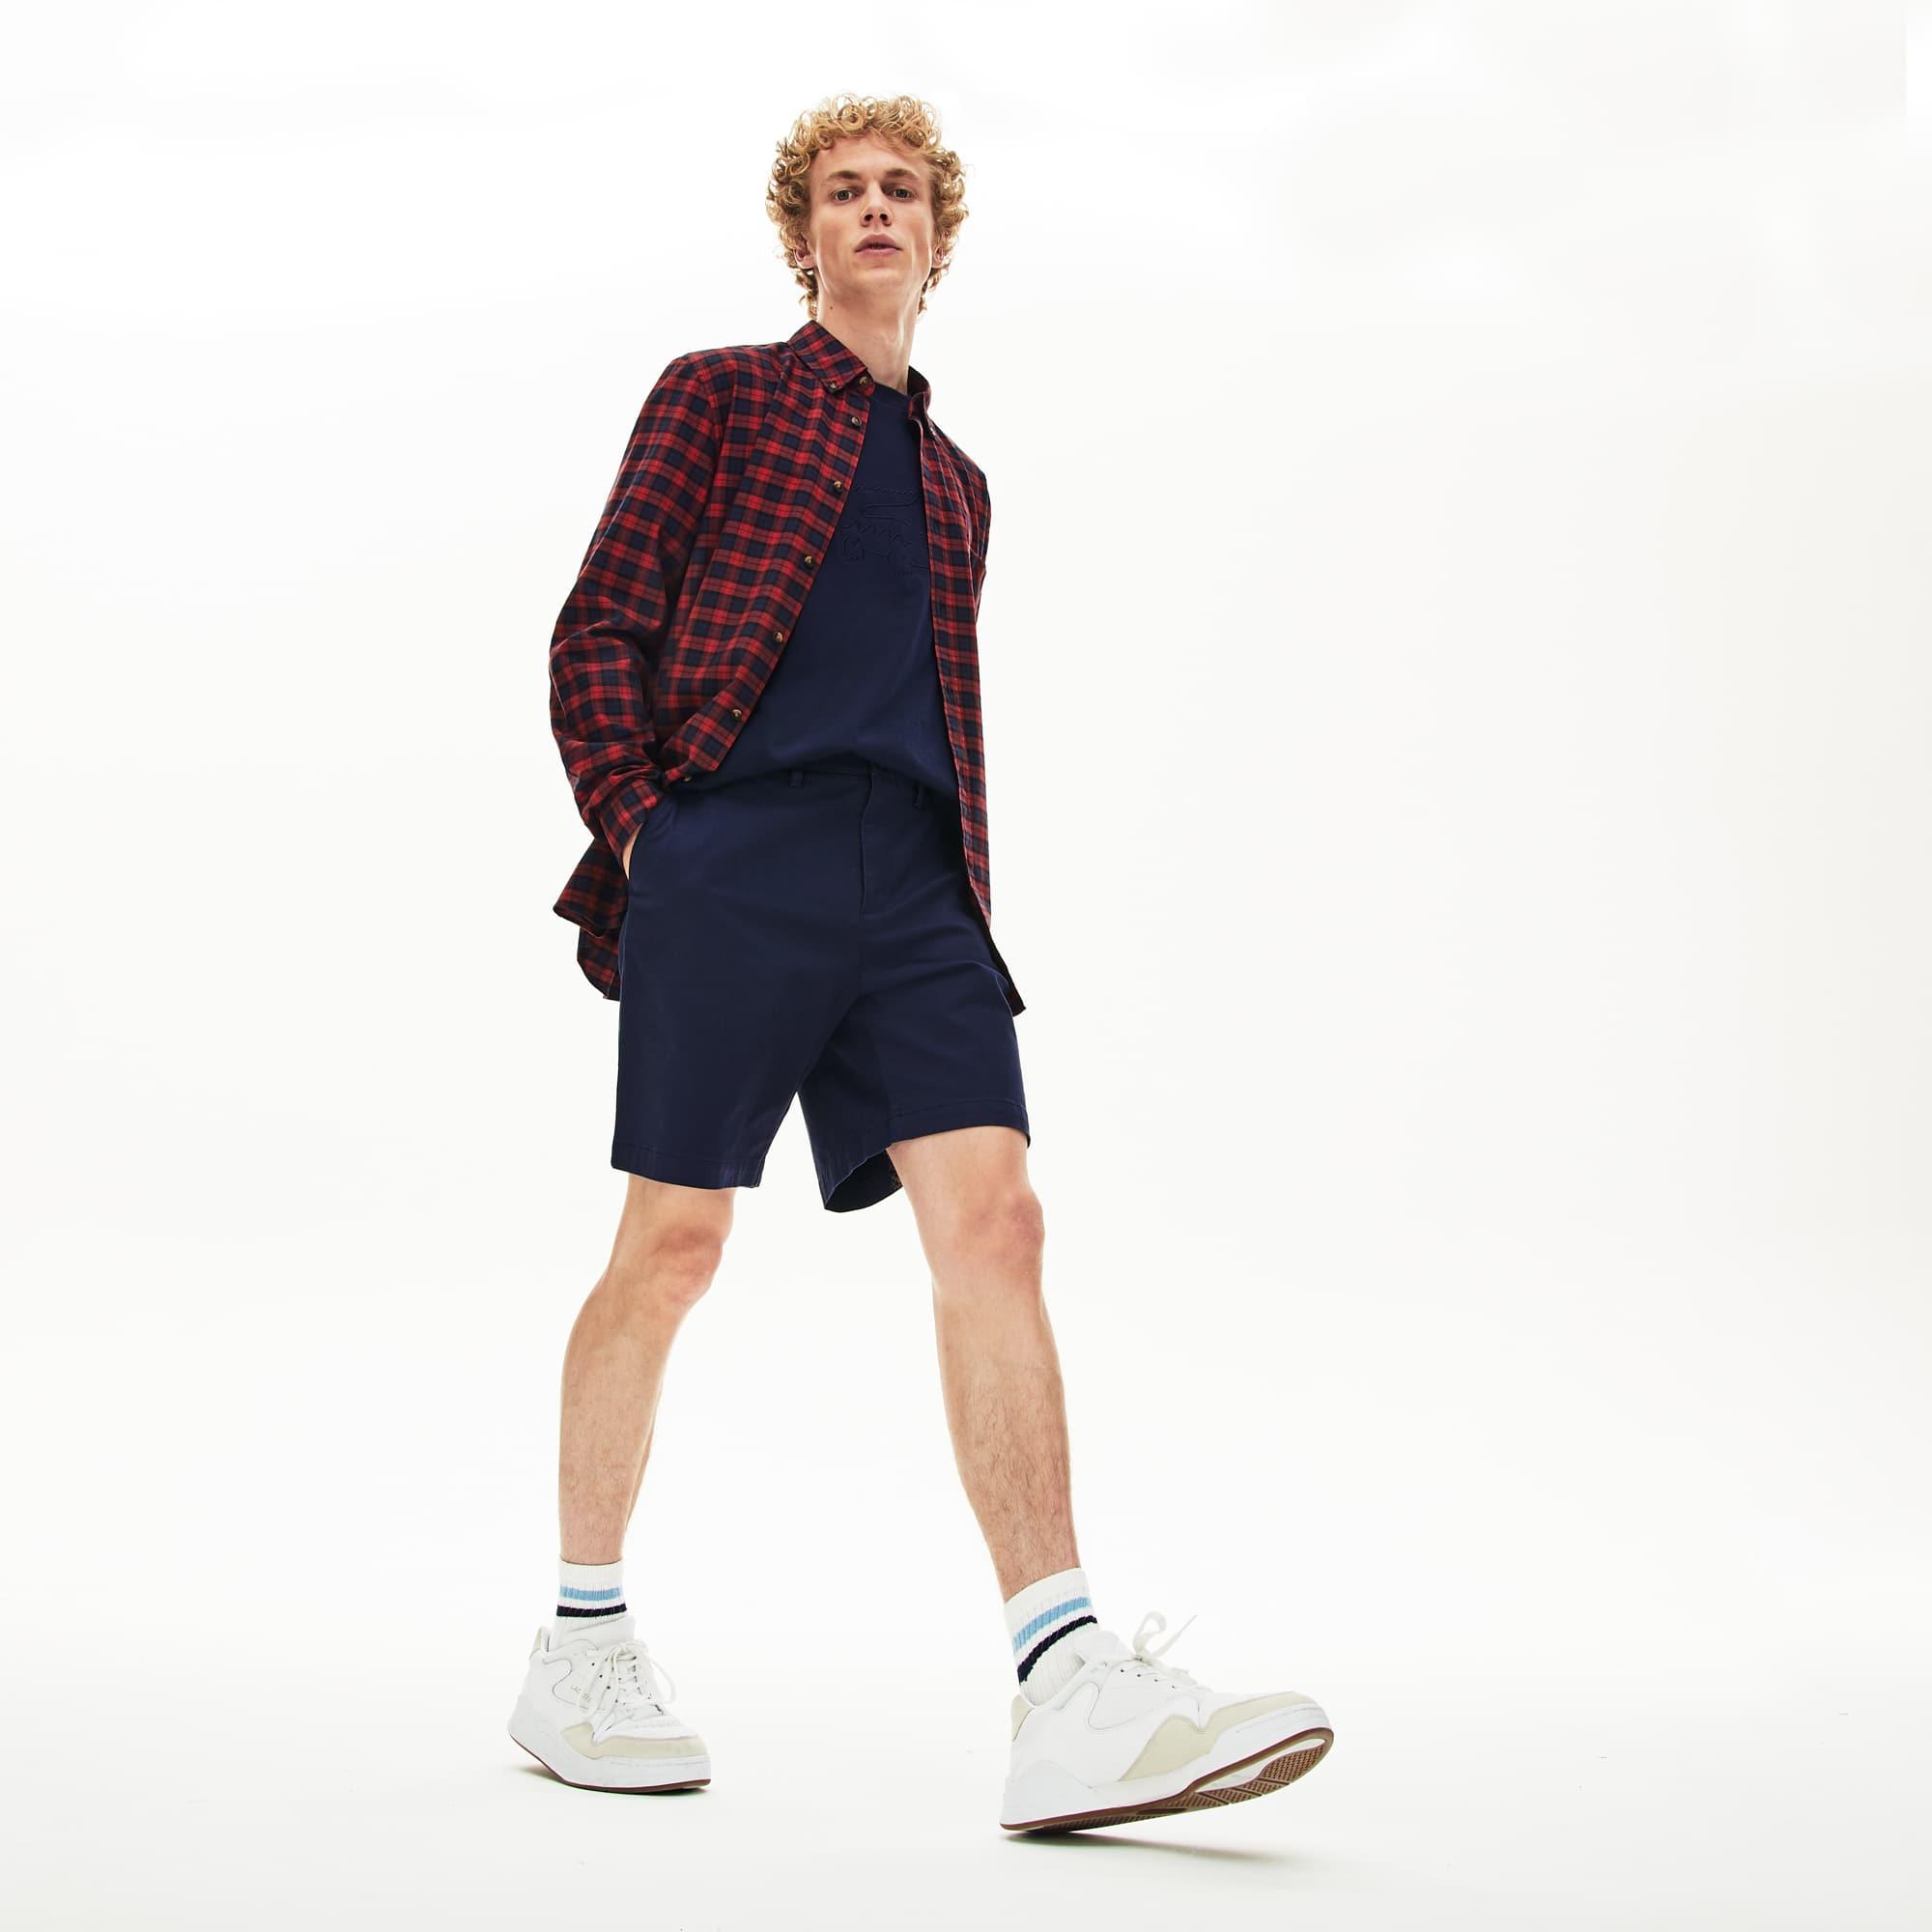 a504b11ad8d Men's Regular Fit Cotton Gabardine Bermuda Shorts